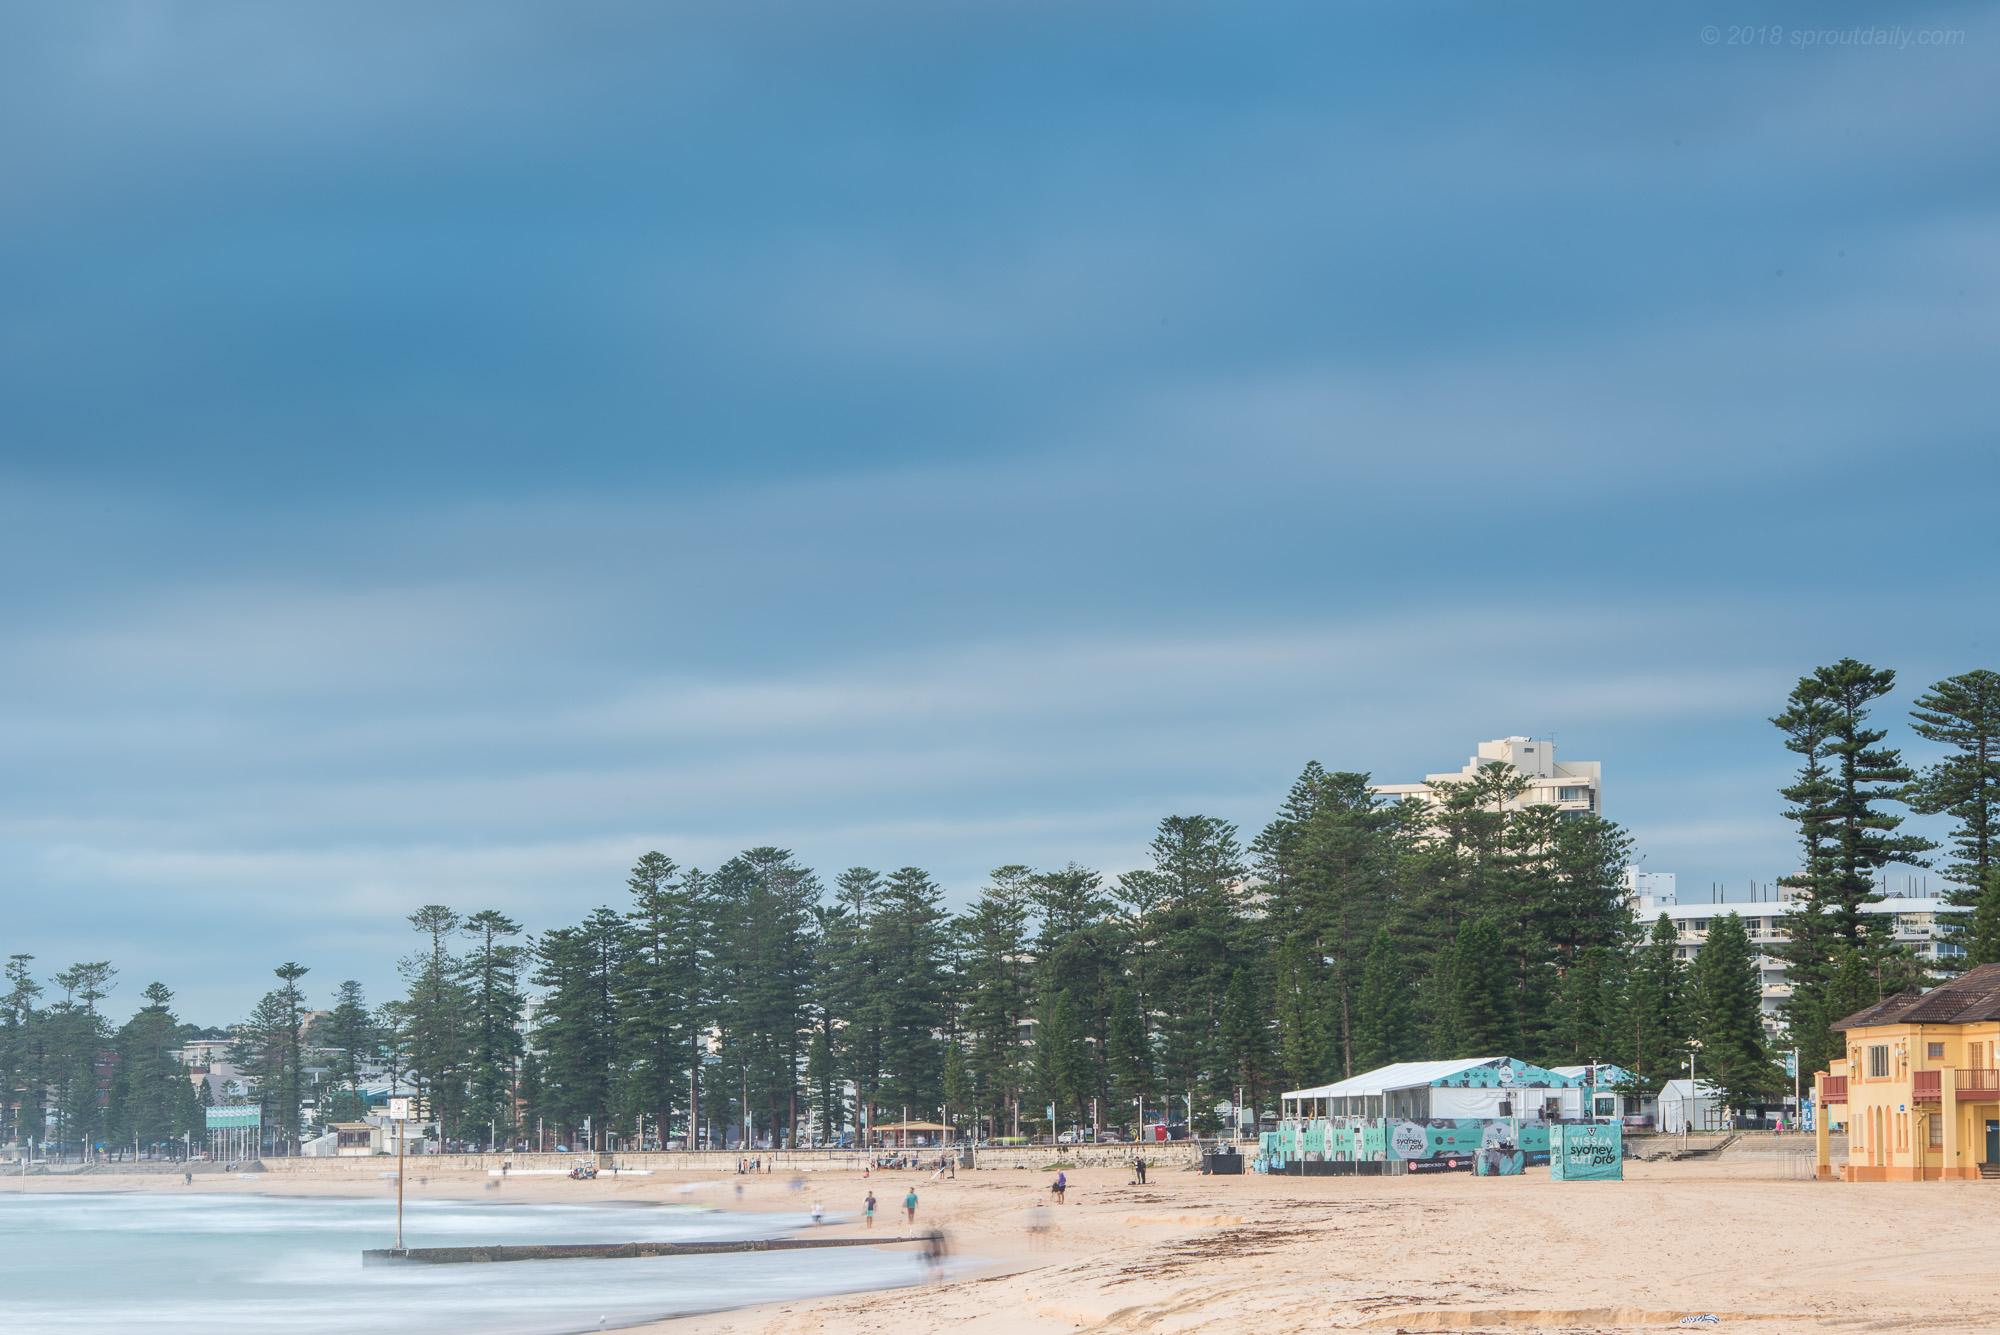 Vissla Sydney Pro - Kicking off over the weekend